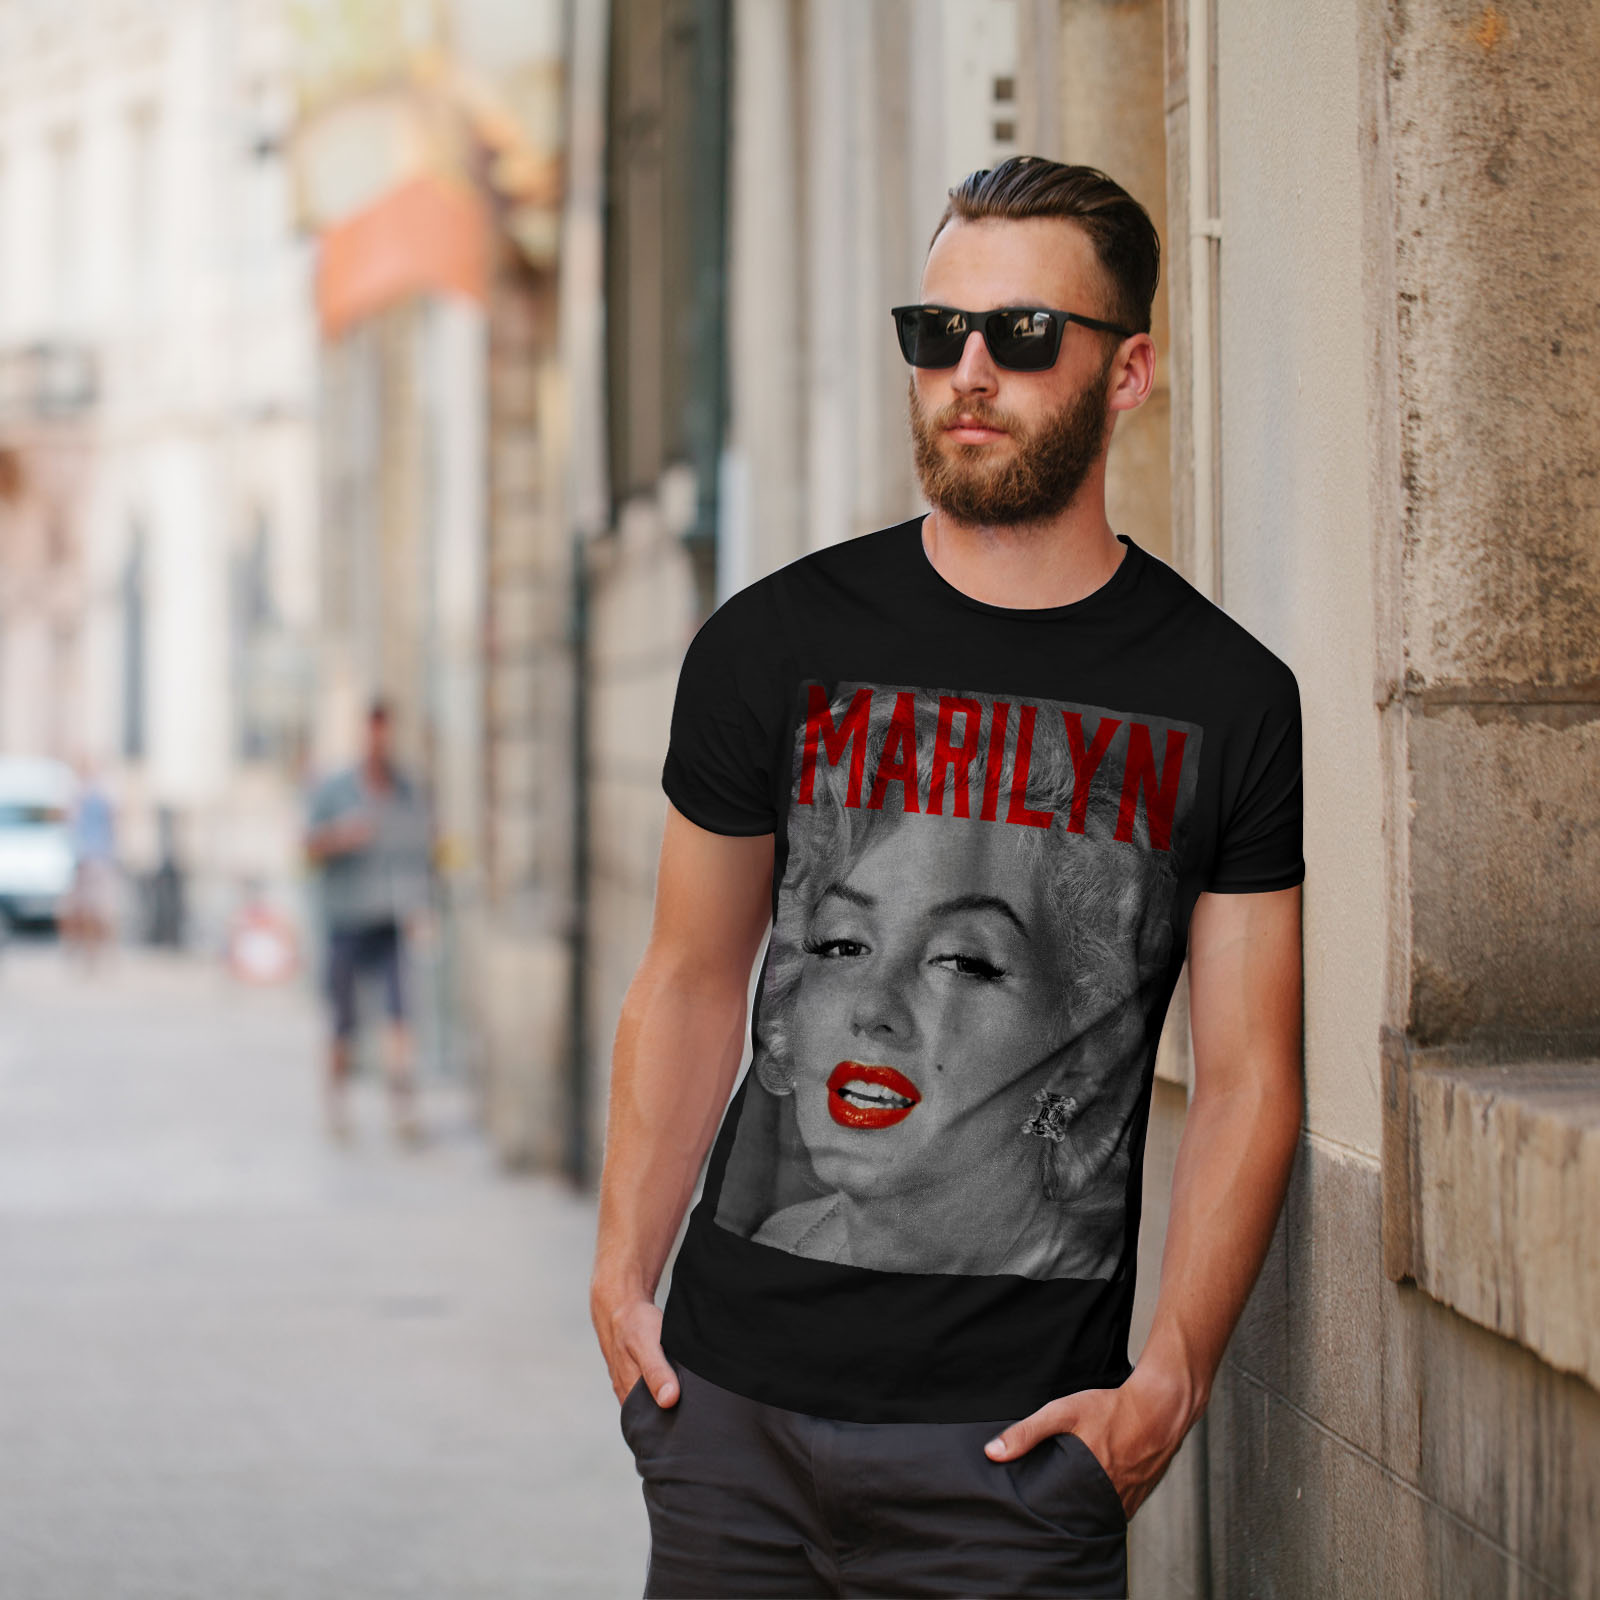 Wellcoda-Marilyn-Retro-Photo-Mens-T-shirt-Urban-Graphic-Design-Printed-Tee thumbnail 5